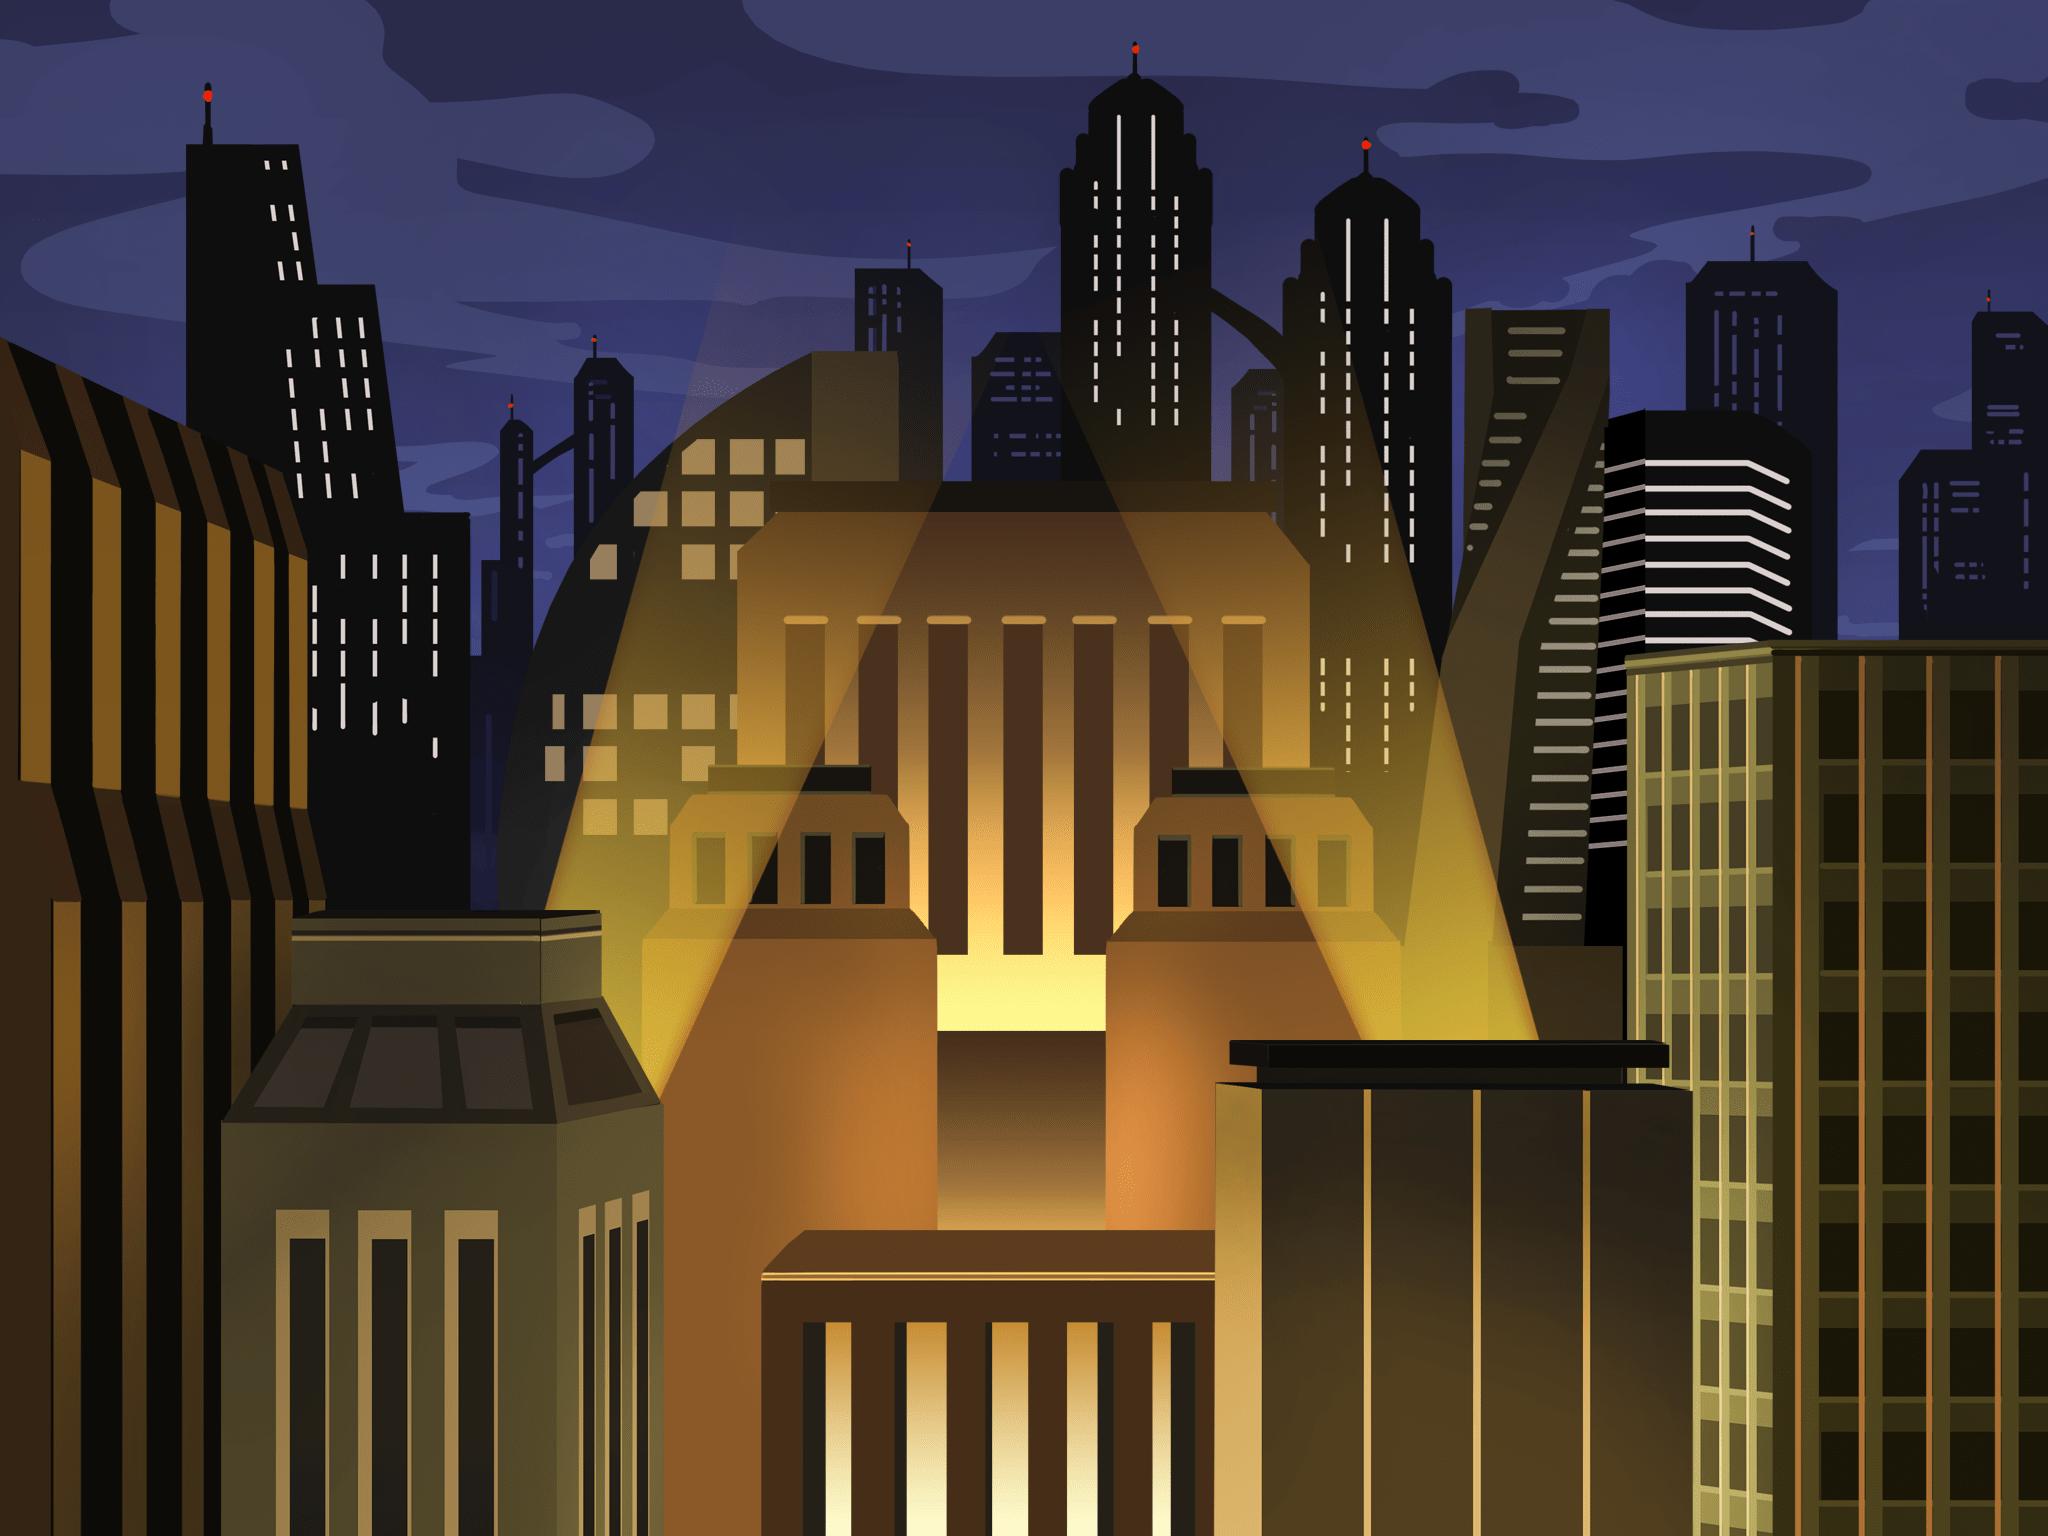 The Algebra Inspectors City Art